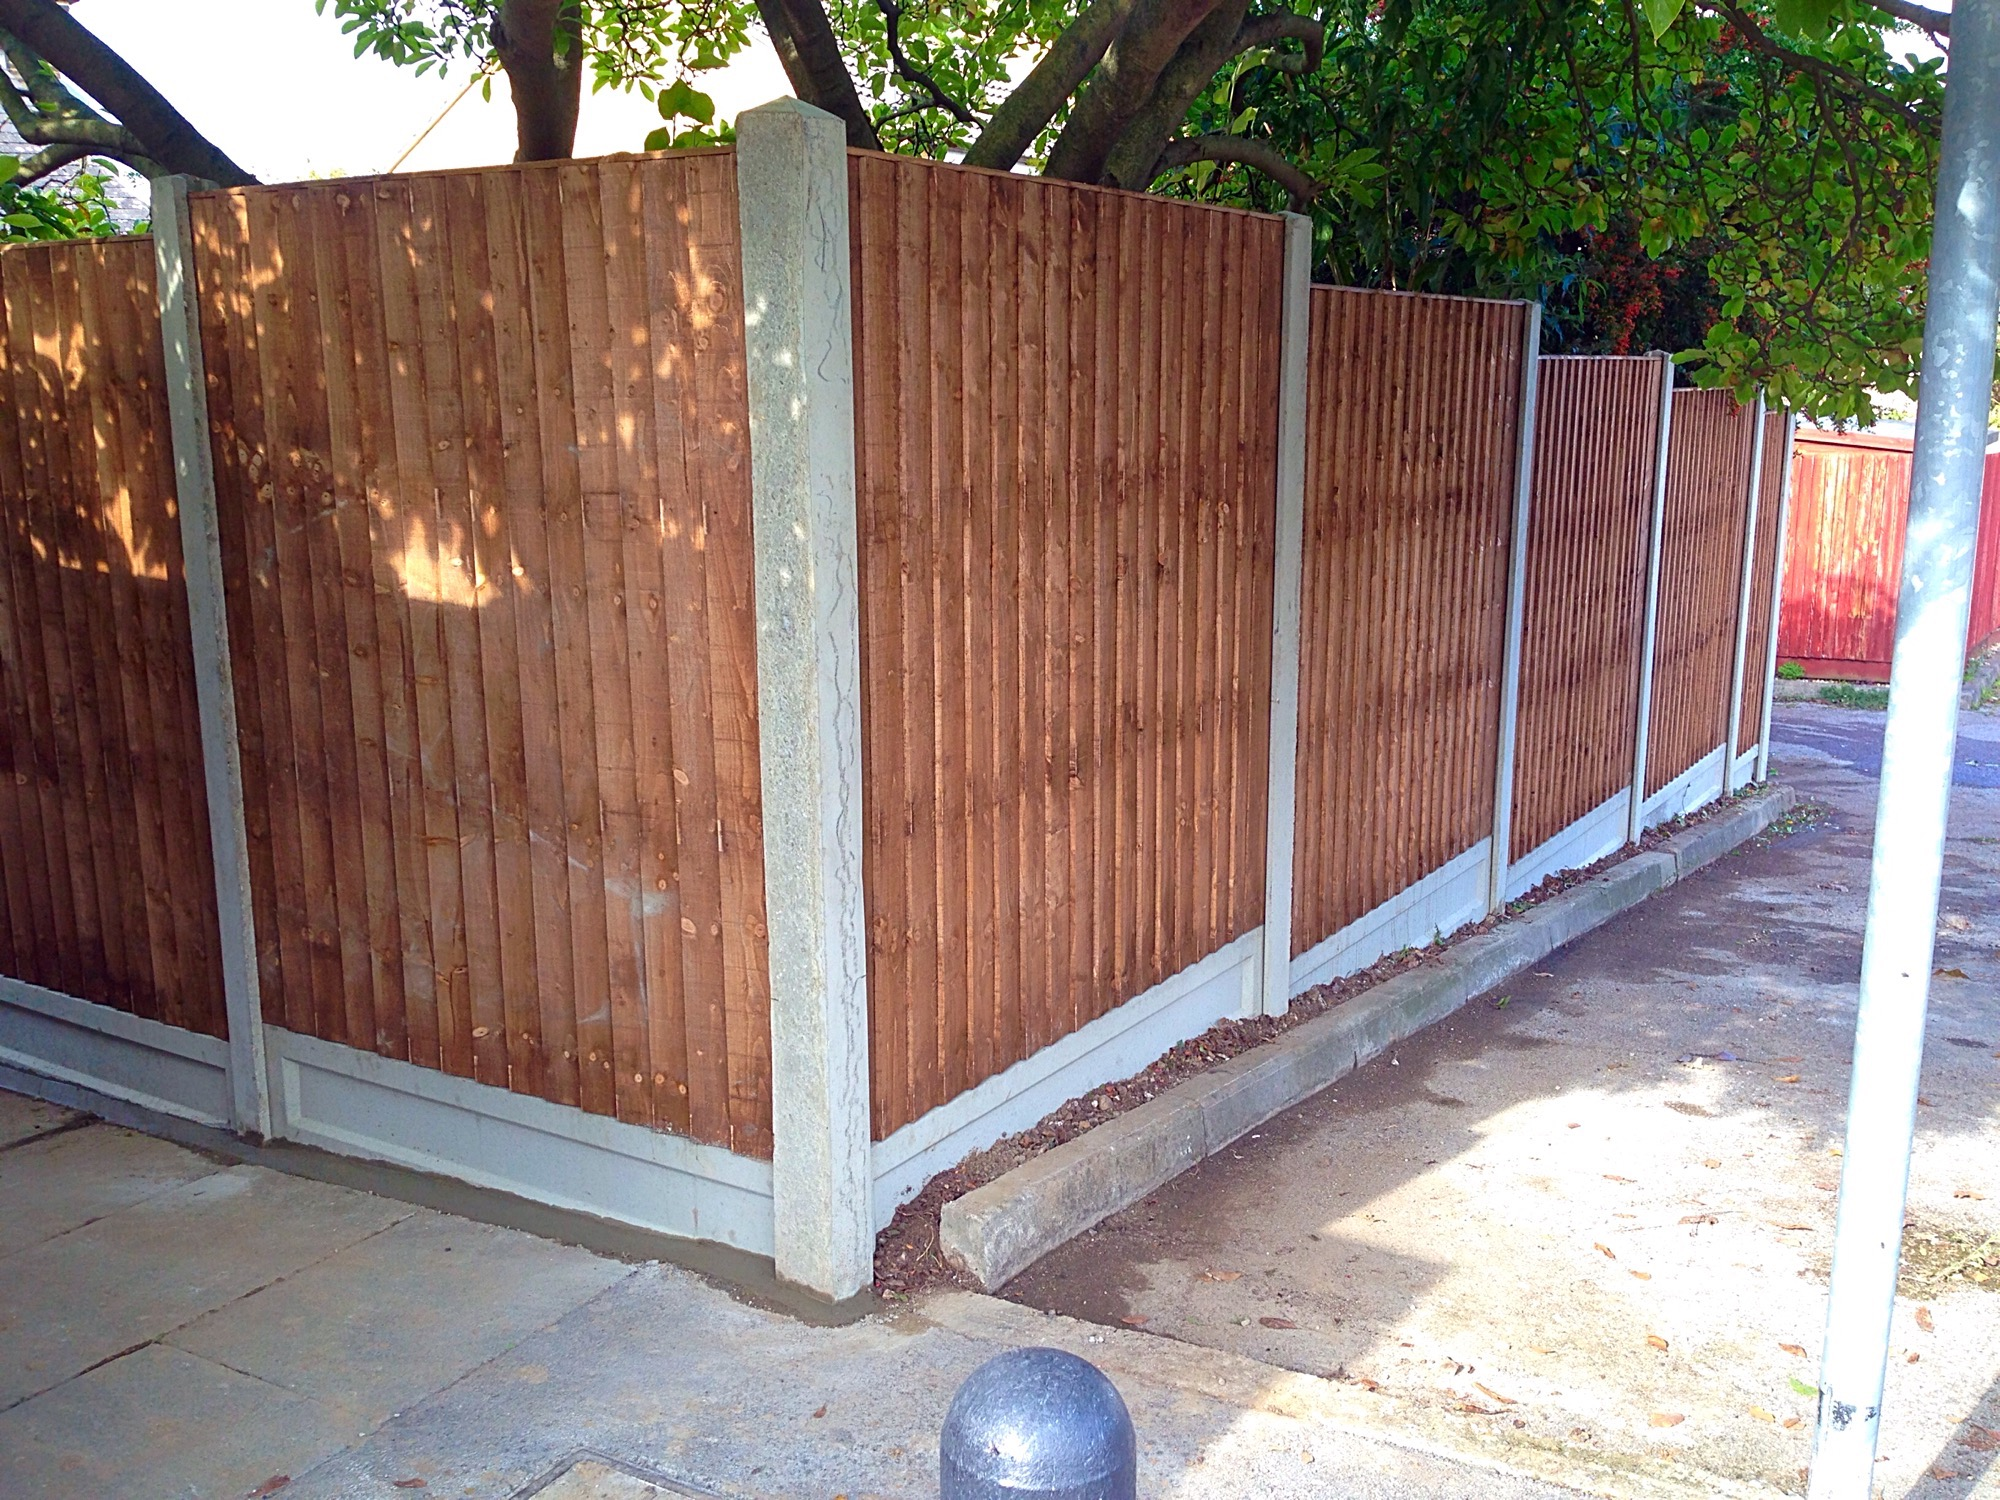 Wooden fence contractor in Bexley.